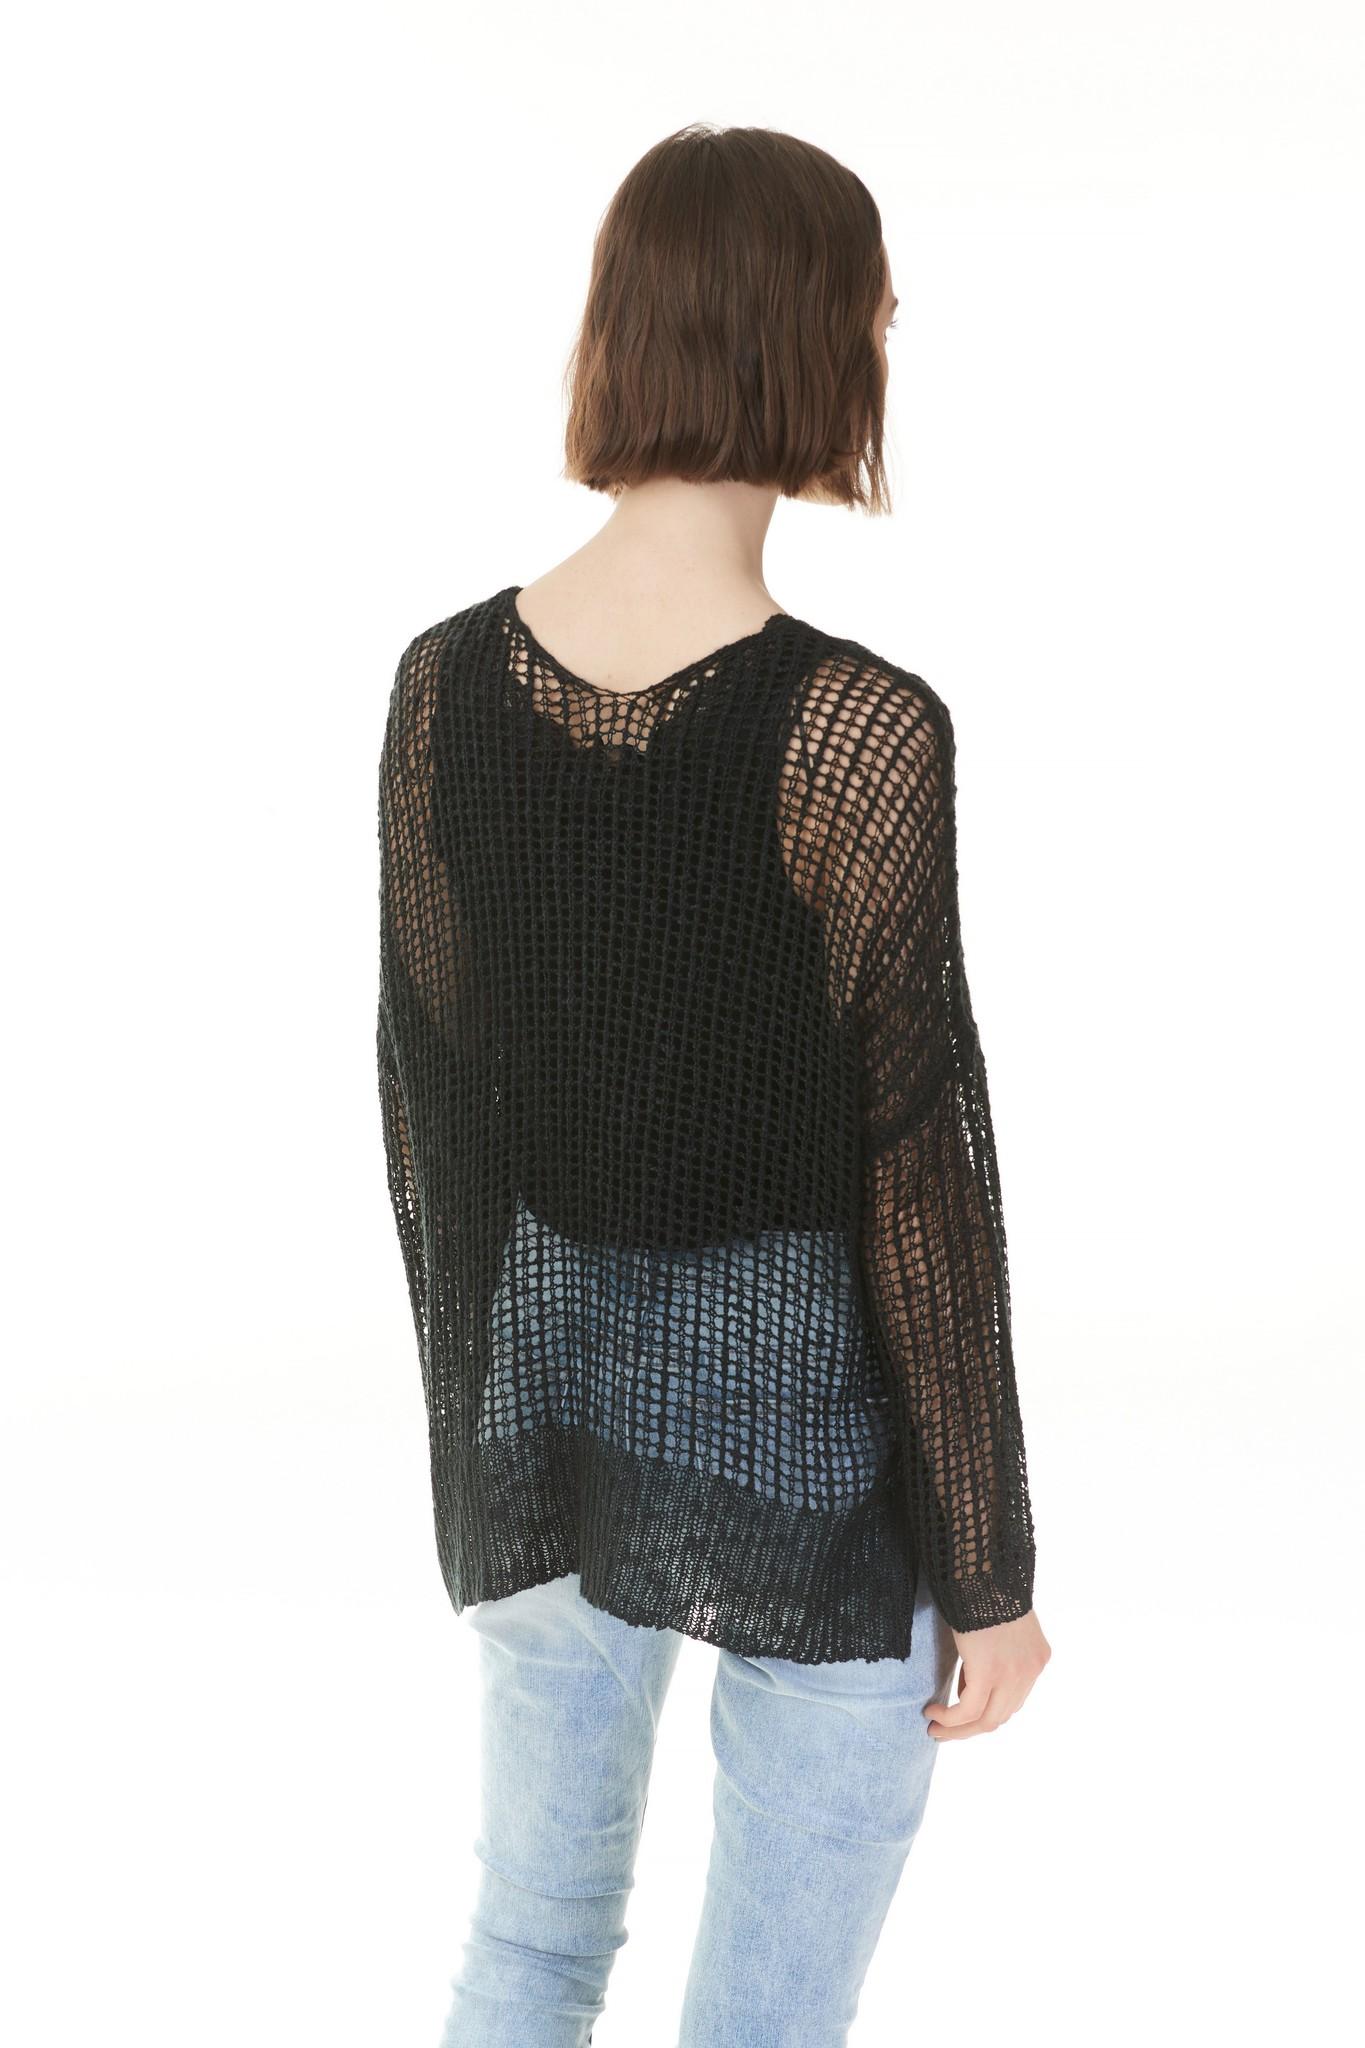 Charlie B Charlie B Crochet Top - Black